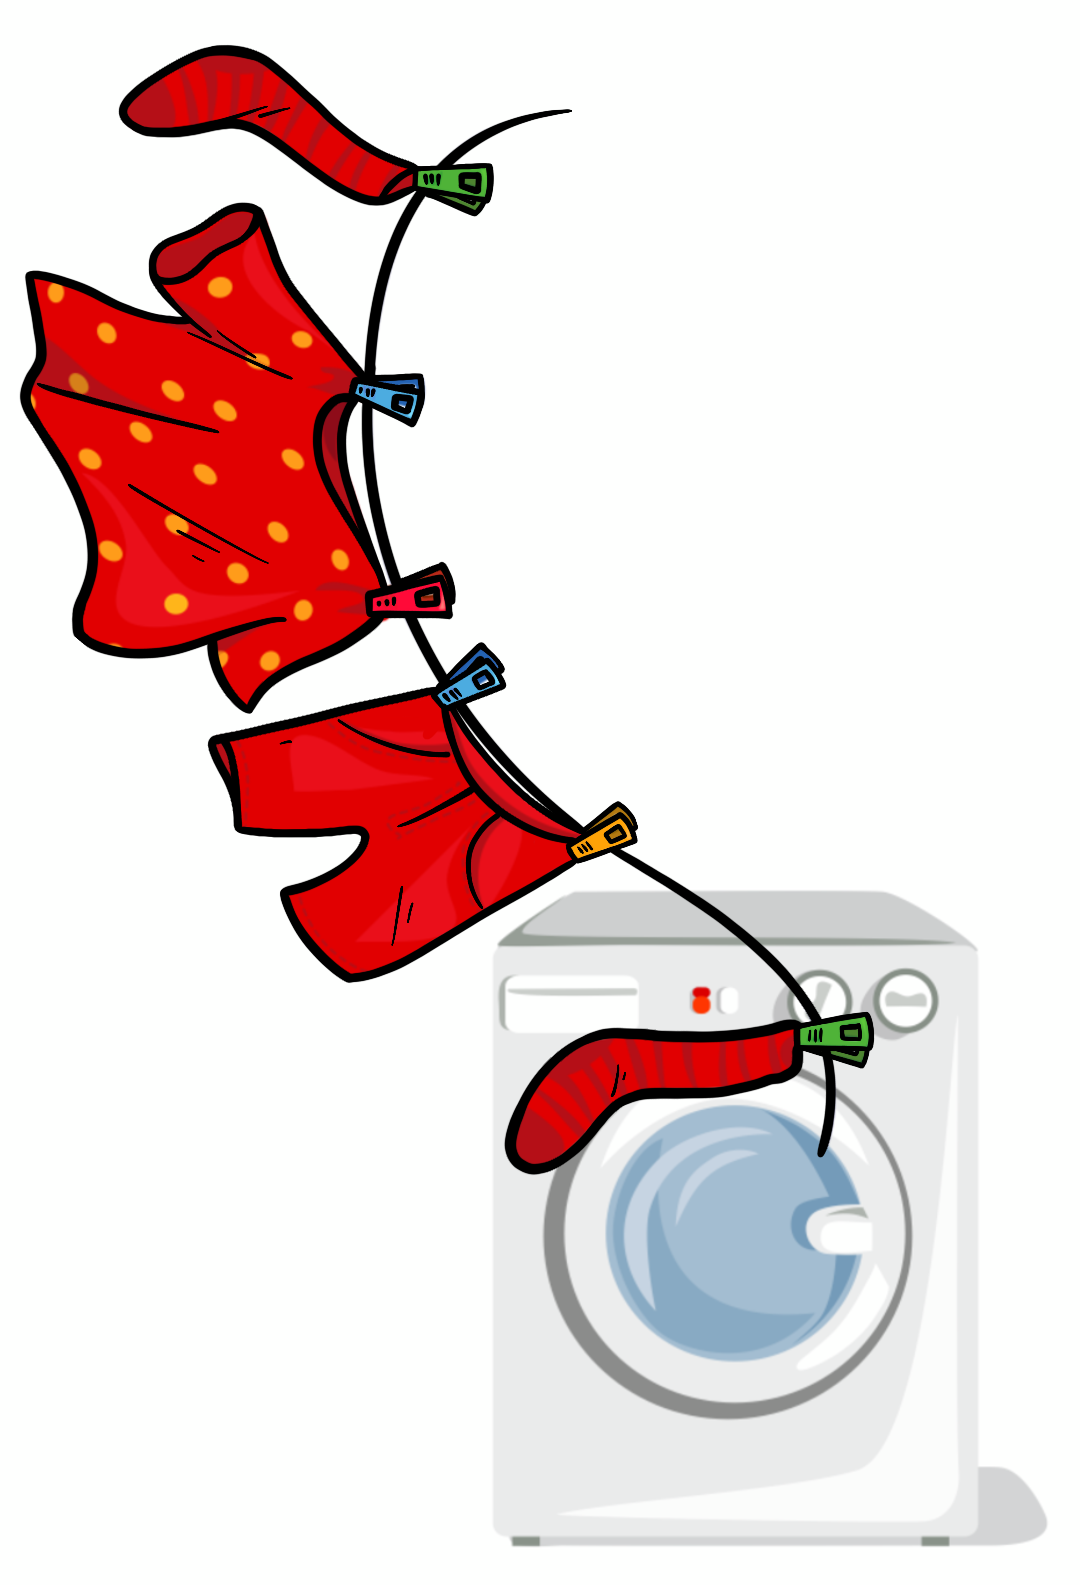 Washing line and washing machine